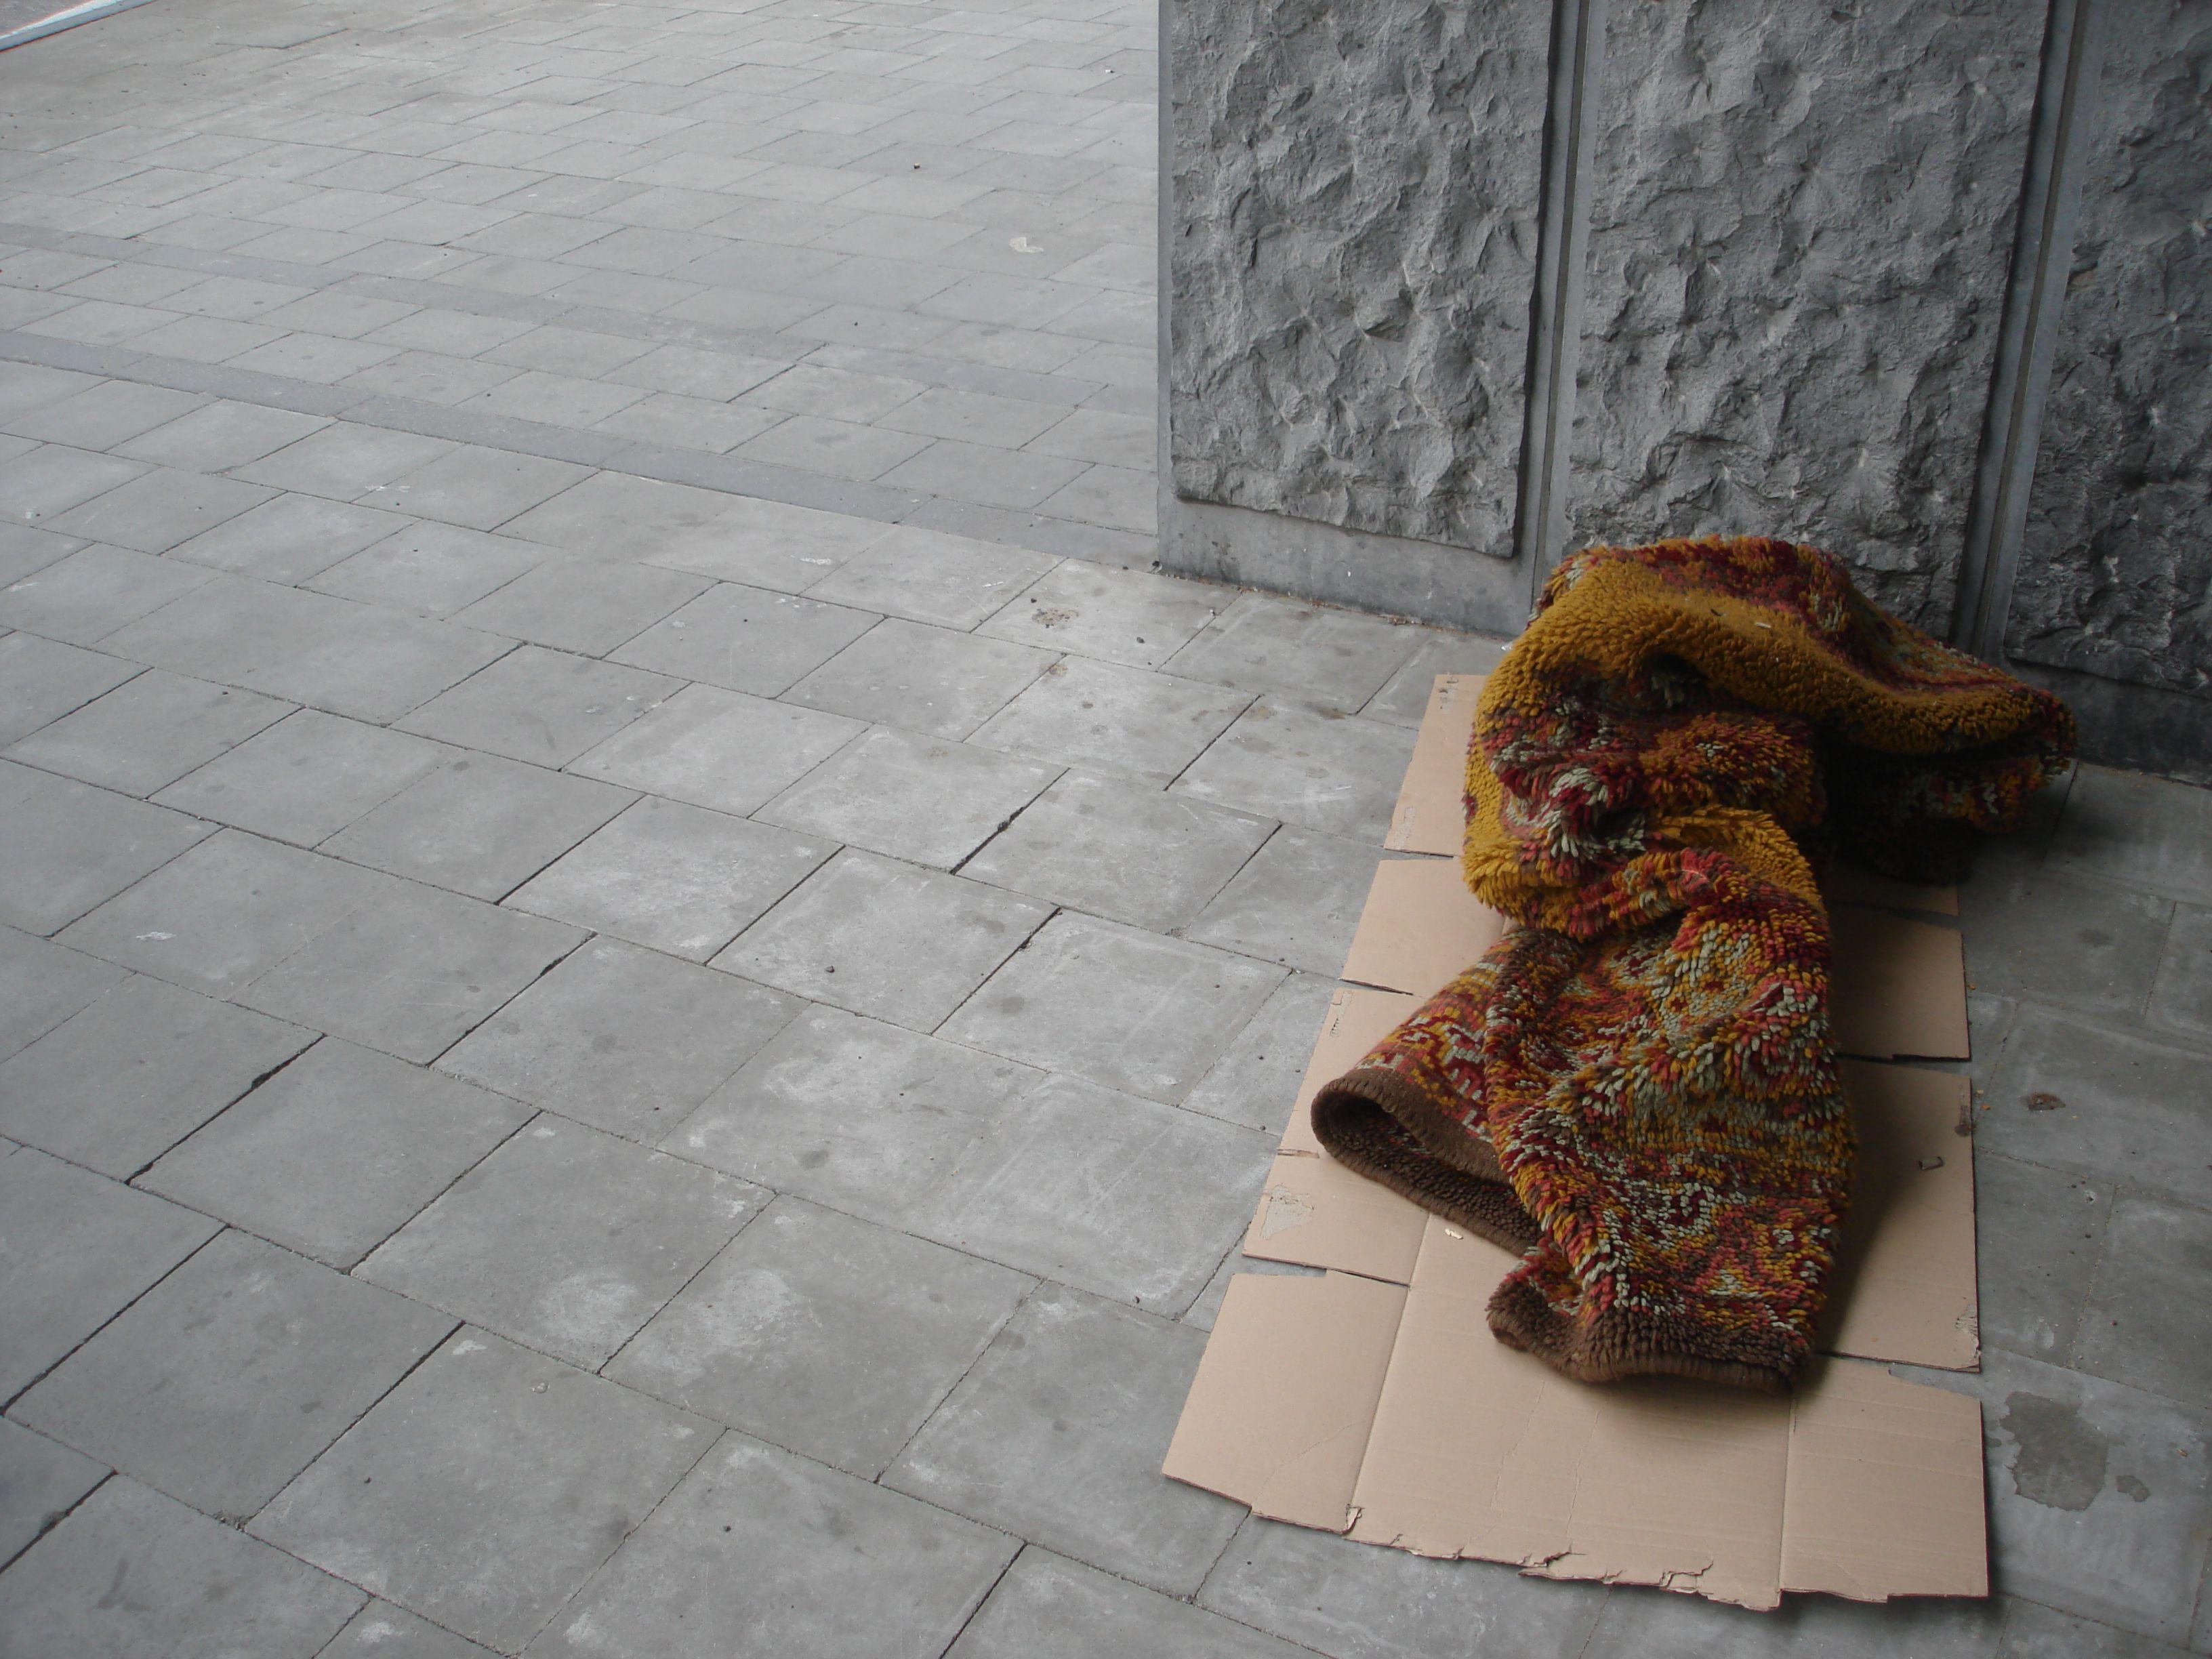 Dakloosheid onder jongeren in België: Woelige levensloop, troebele toekomstvisie